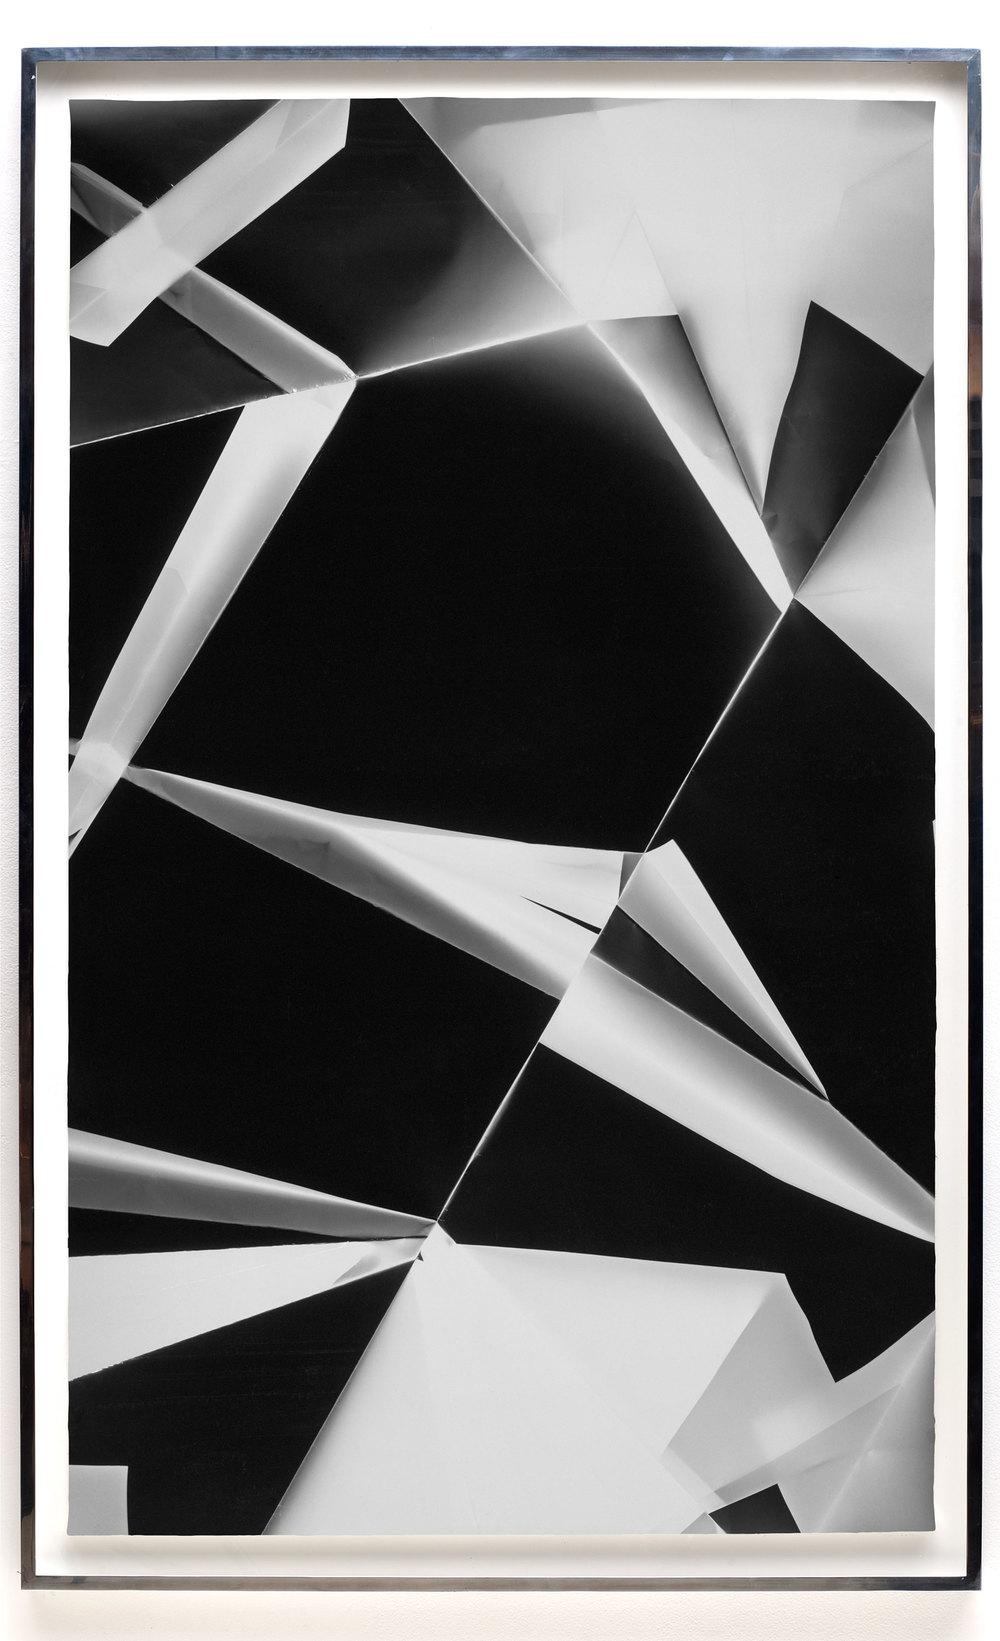 Fold (0º/90º/180º/270º directional light sources), June 13, 2008, Annandale-On-Hudson, New York, Foma Multigrade Fiber    2009   Black and white fiber based photographic paper  74 x 46 3/4 inches   Legibility on Color Backgrounds, 2009